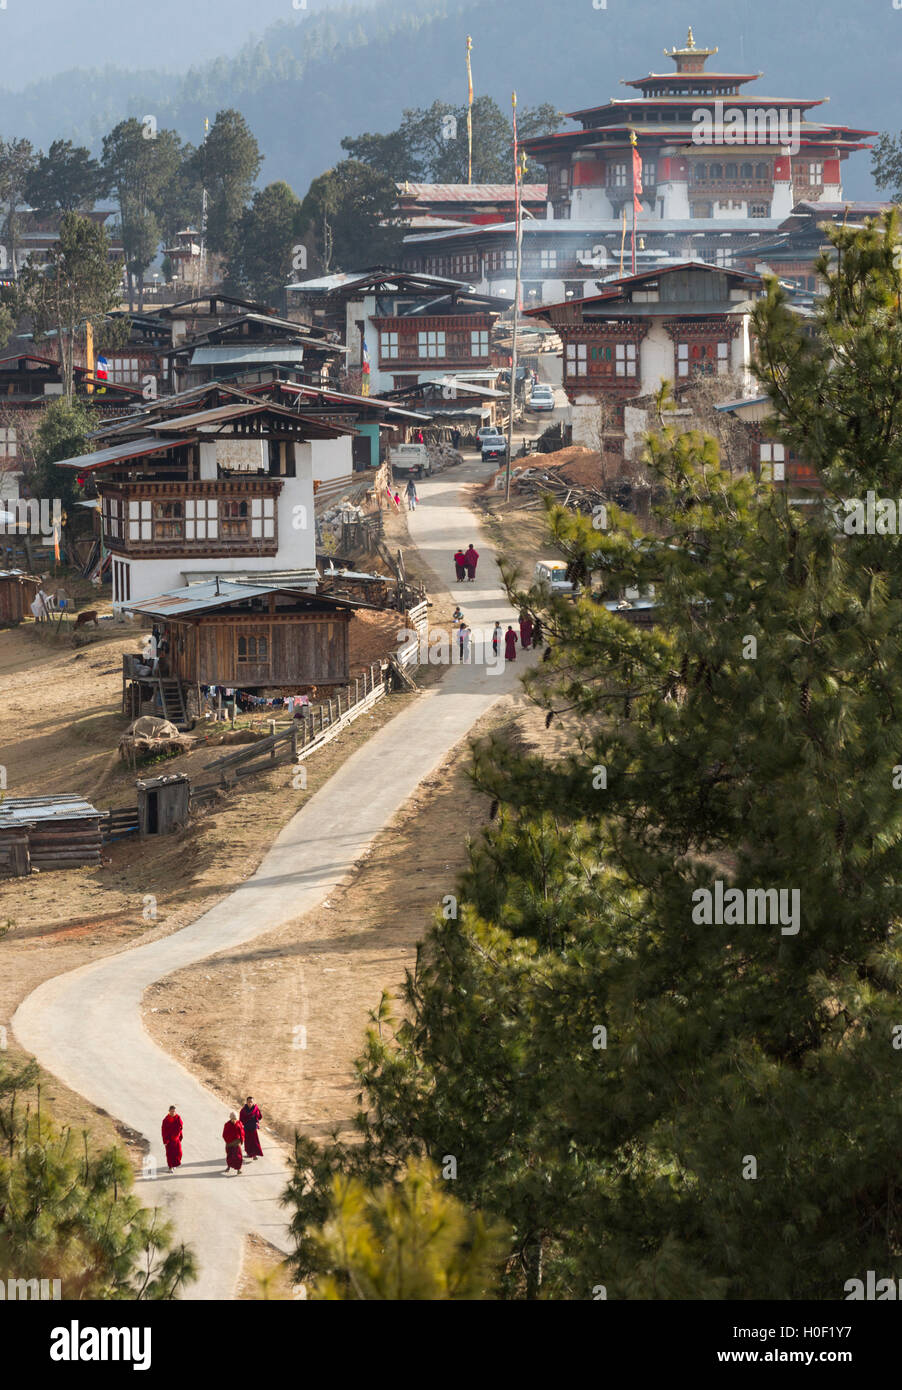 Gangtey Monastery, Phobjikha Valley, Bhutan - Stock Image